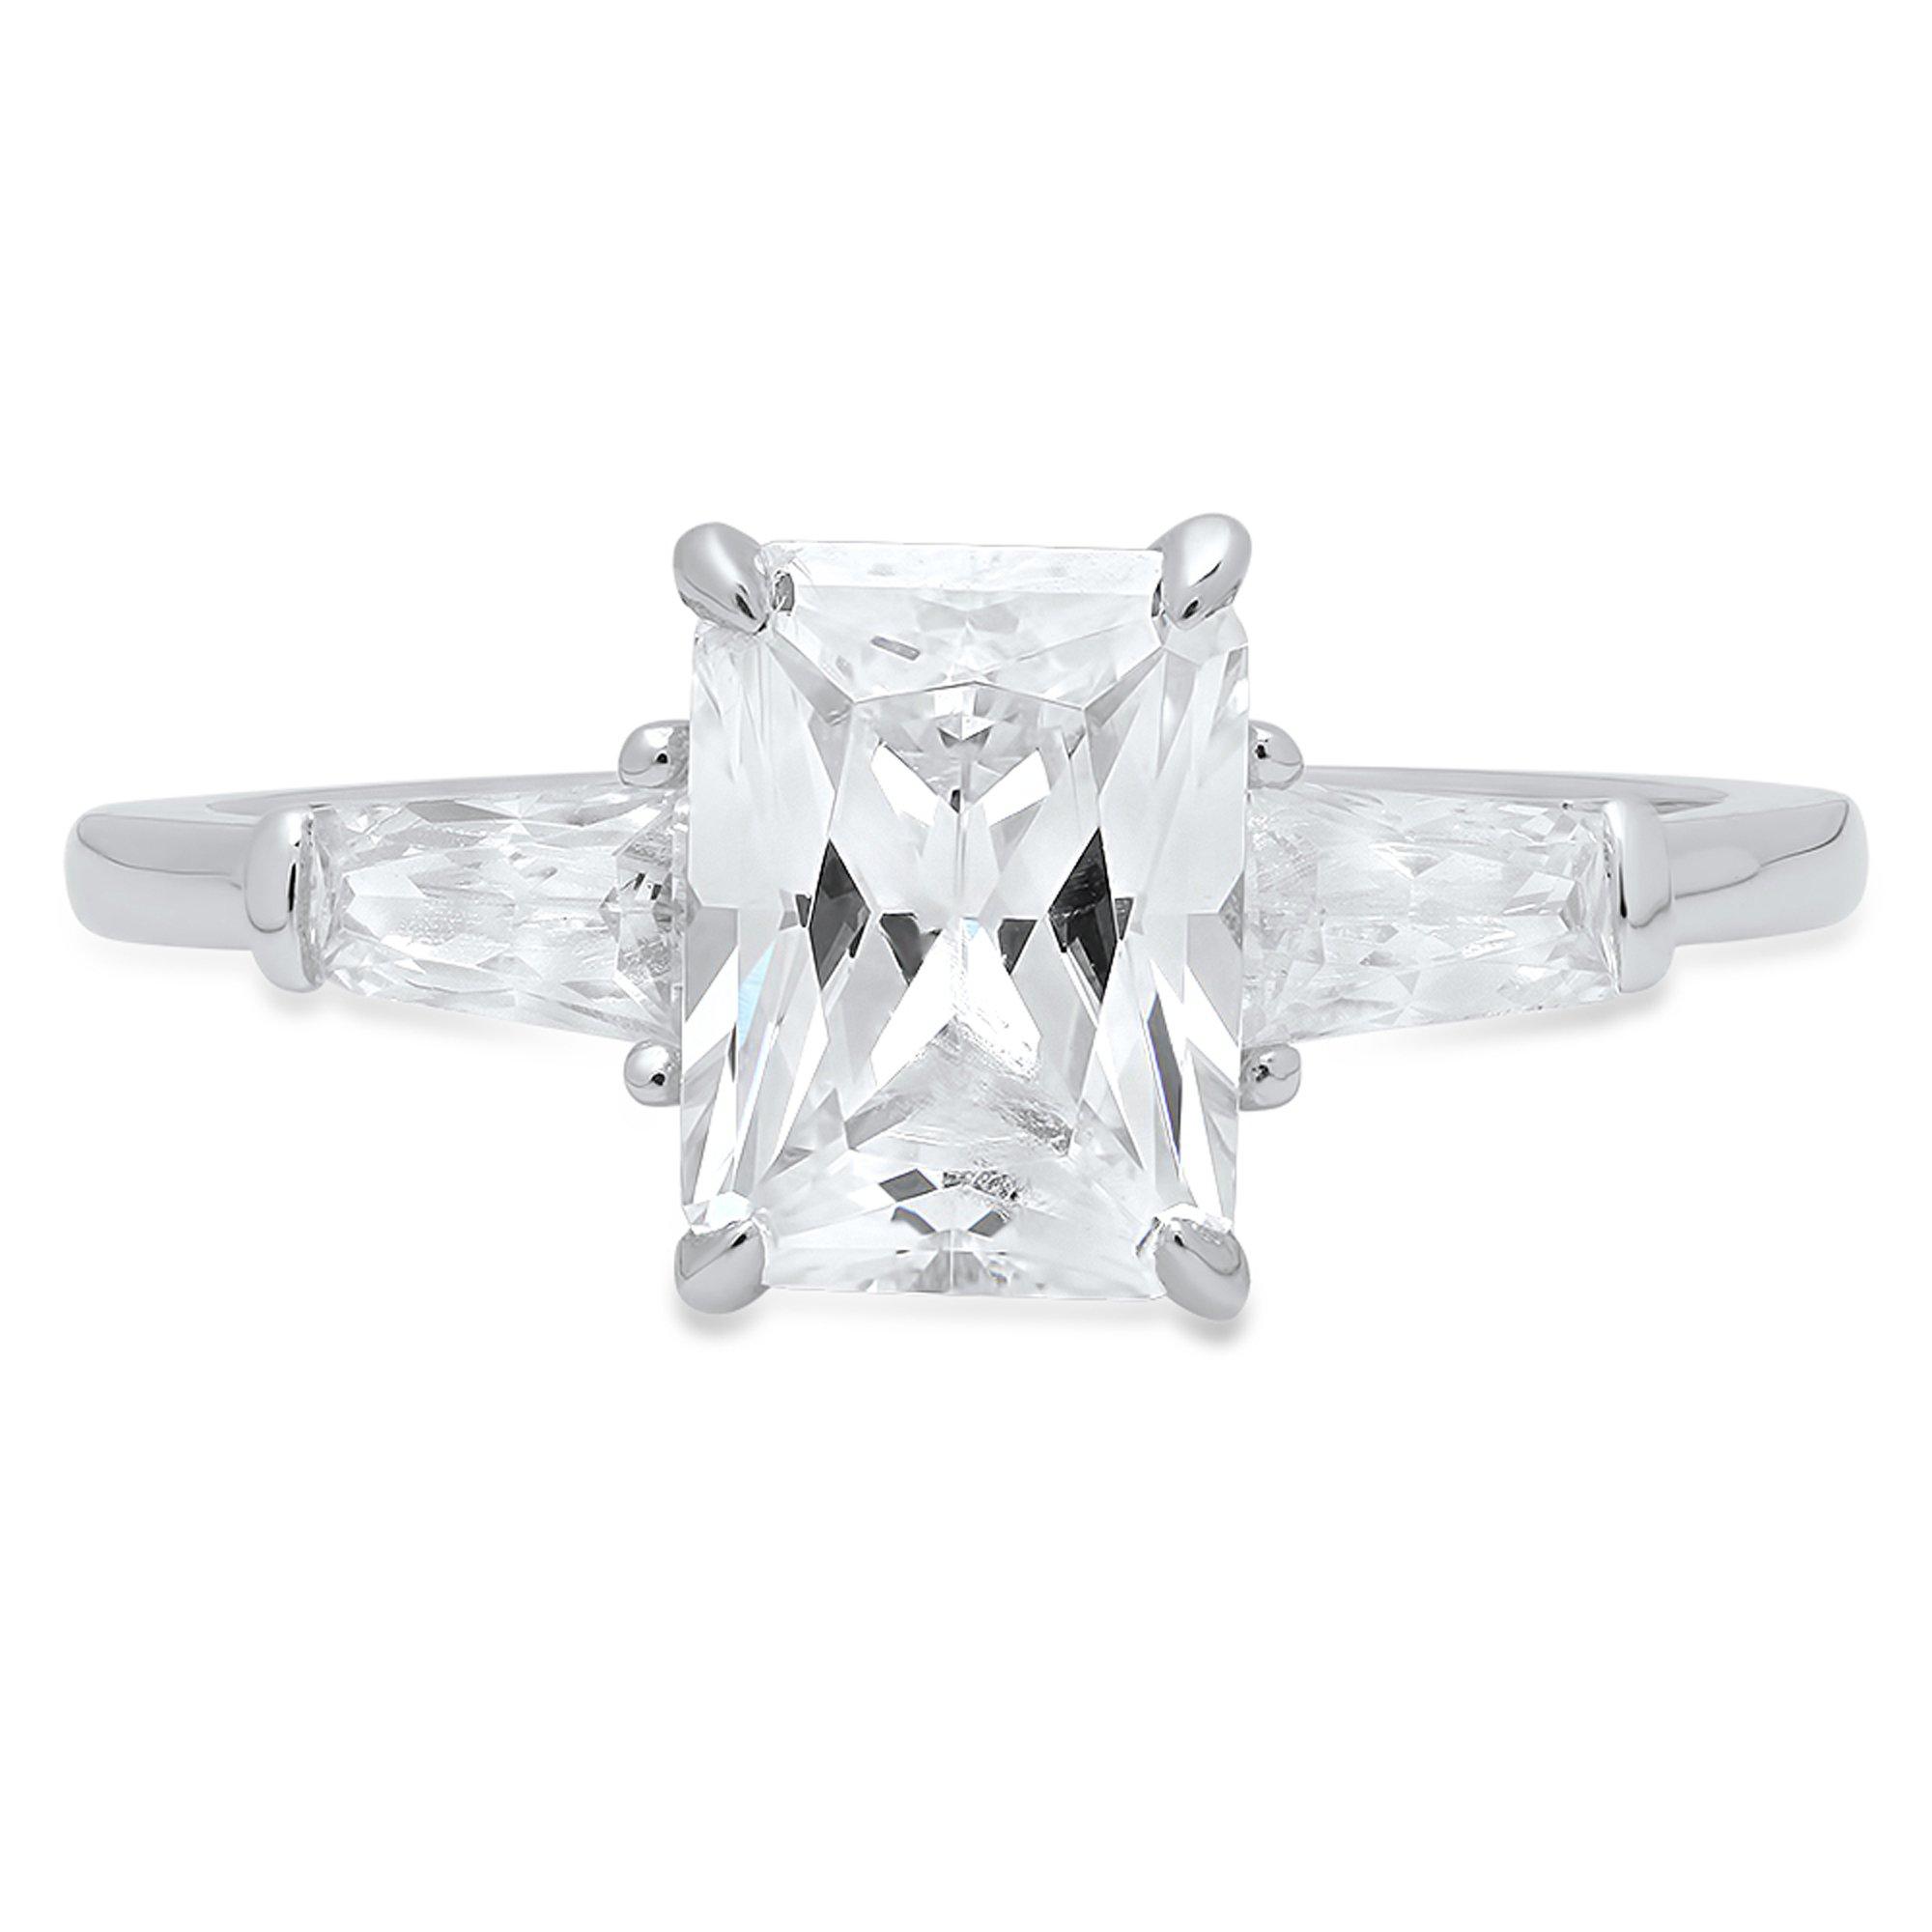 2.10 CT Brilliant Emerald & Baguette Cut Simulated Diamond CZ Designer Solitaire 3-Stone Band Ring Solid 14K White Gold